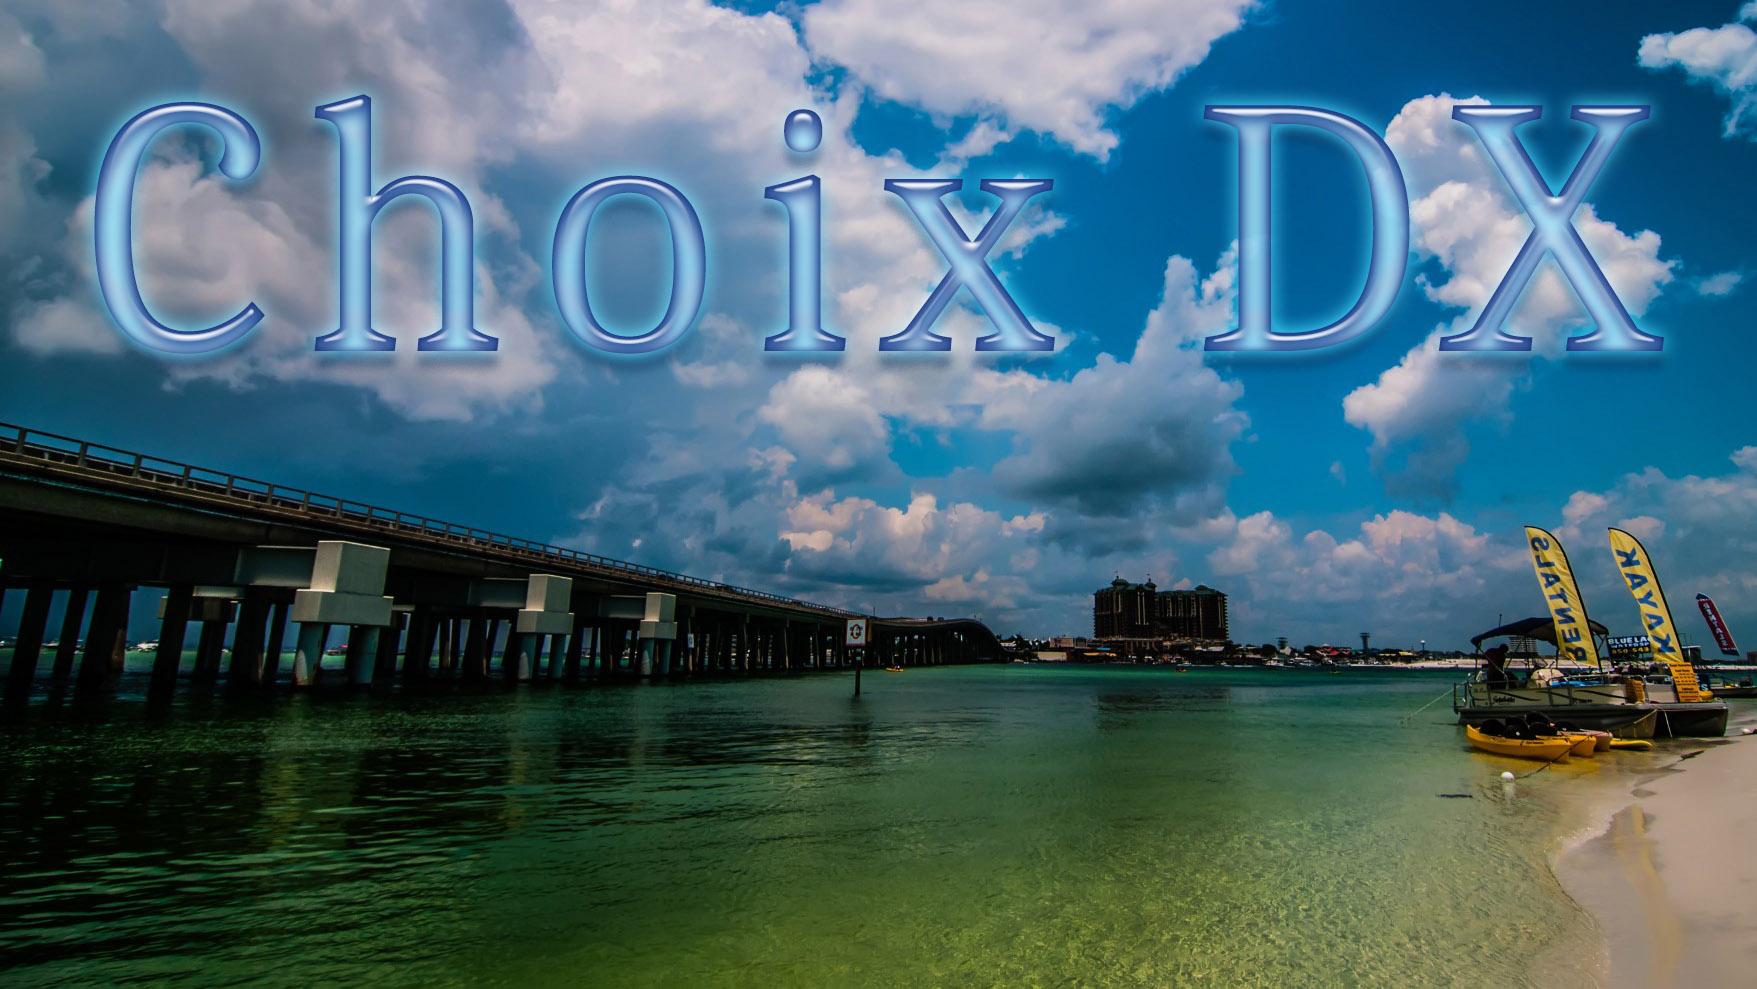 Choixdx